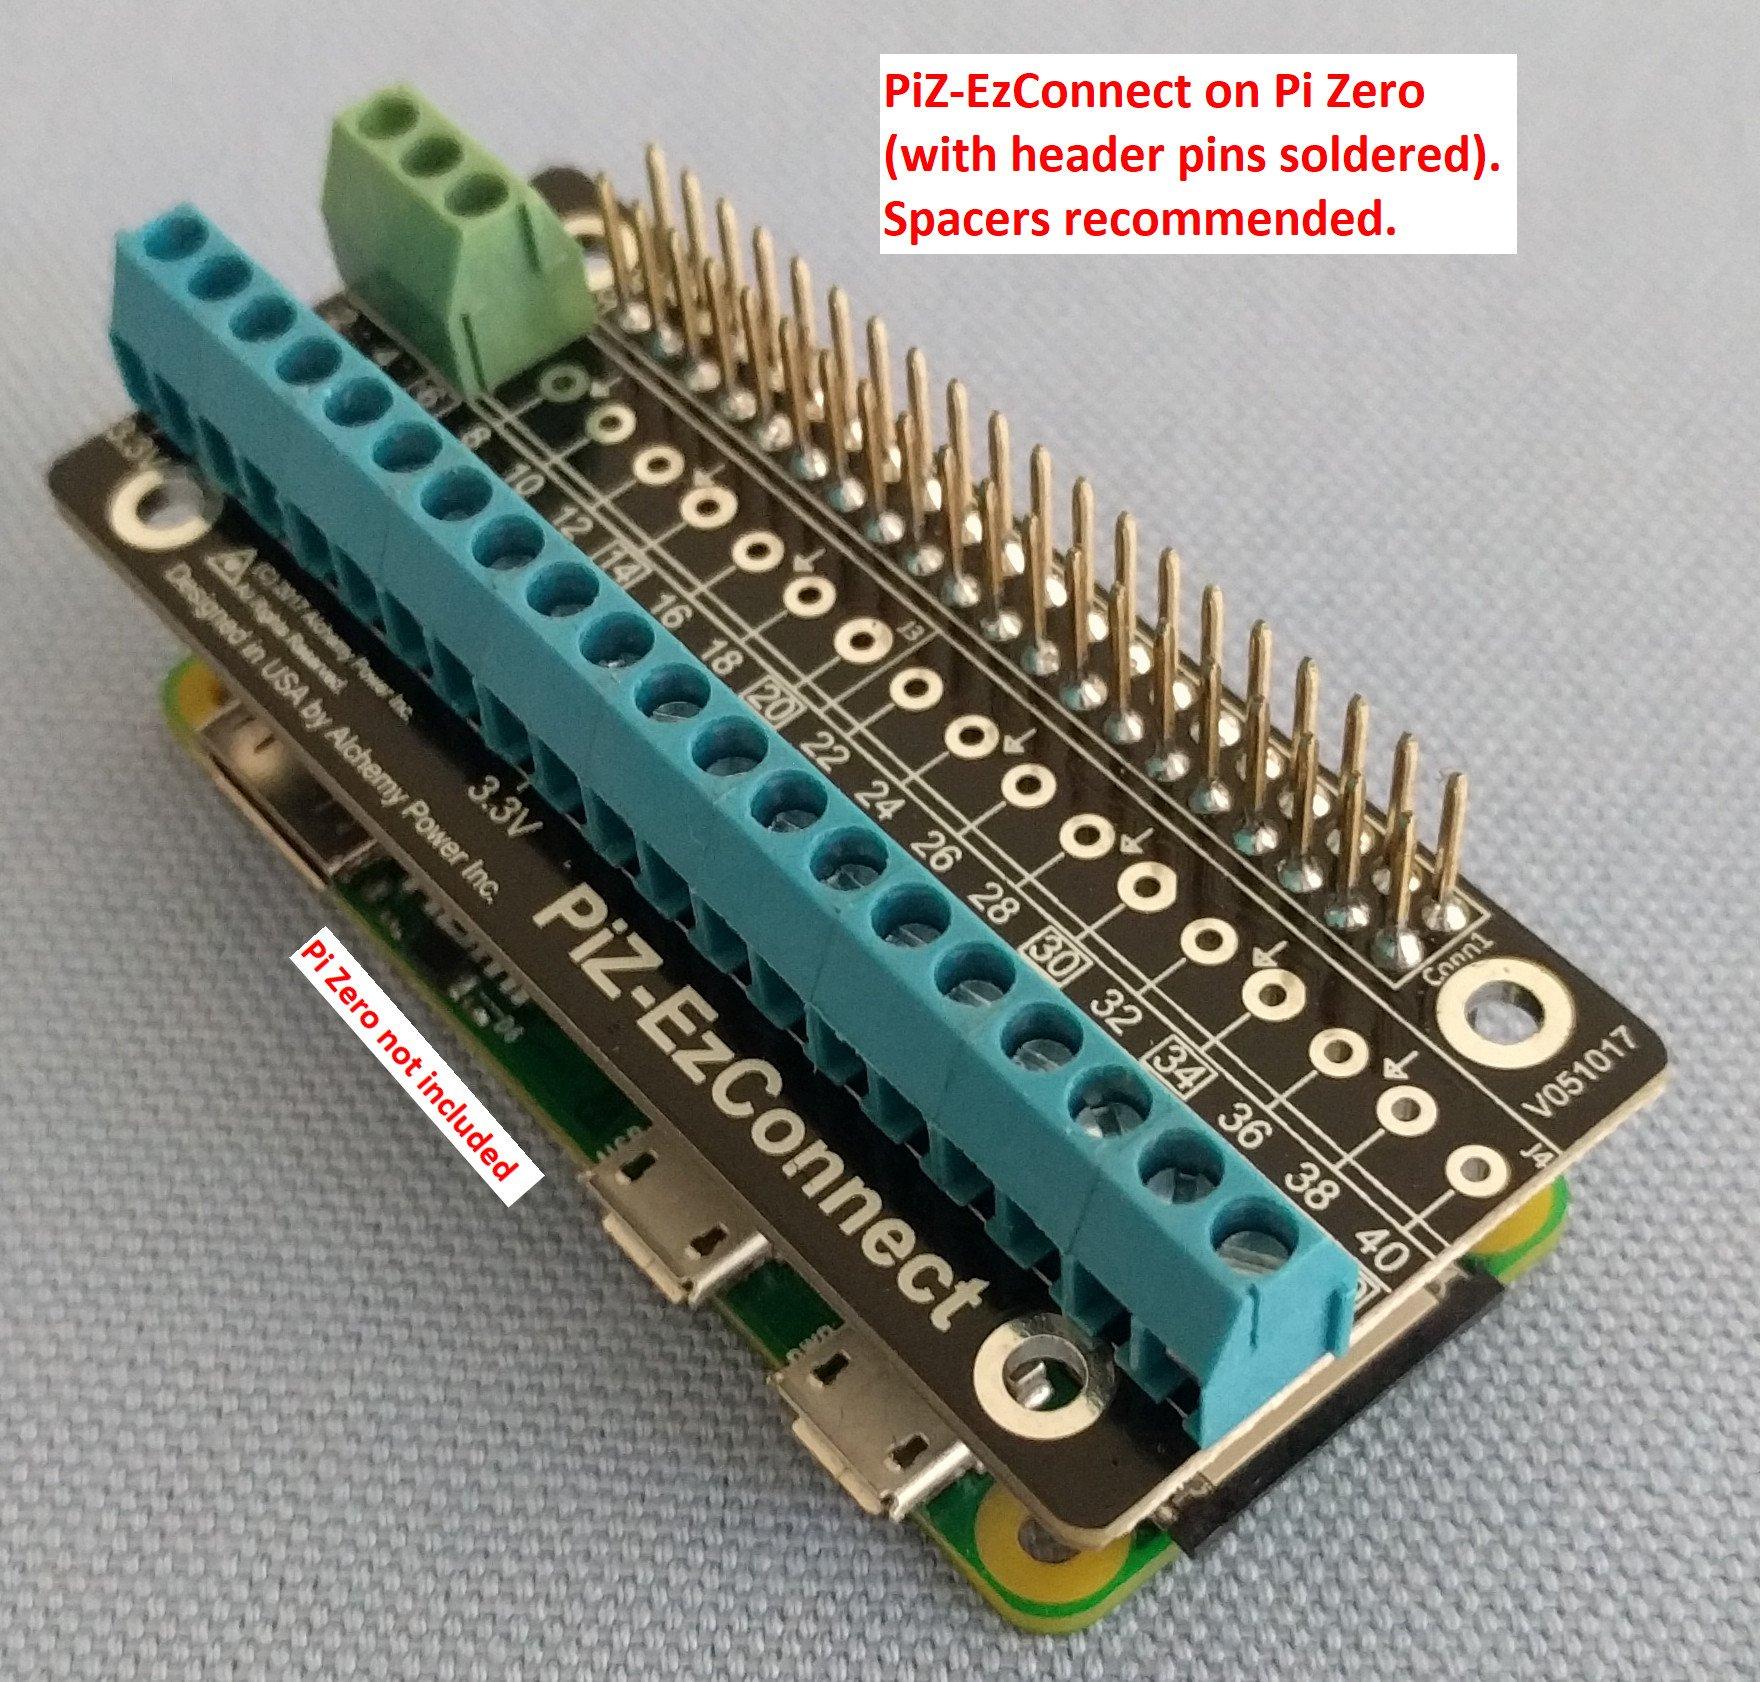 Screw Terminals for the Raspberry Pi and Pi Zero